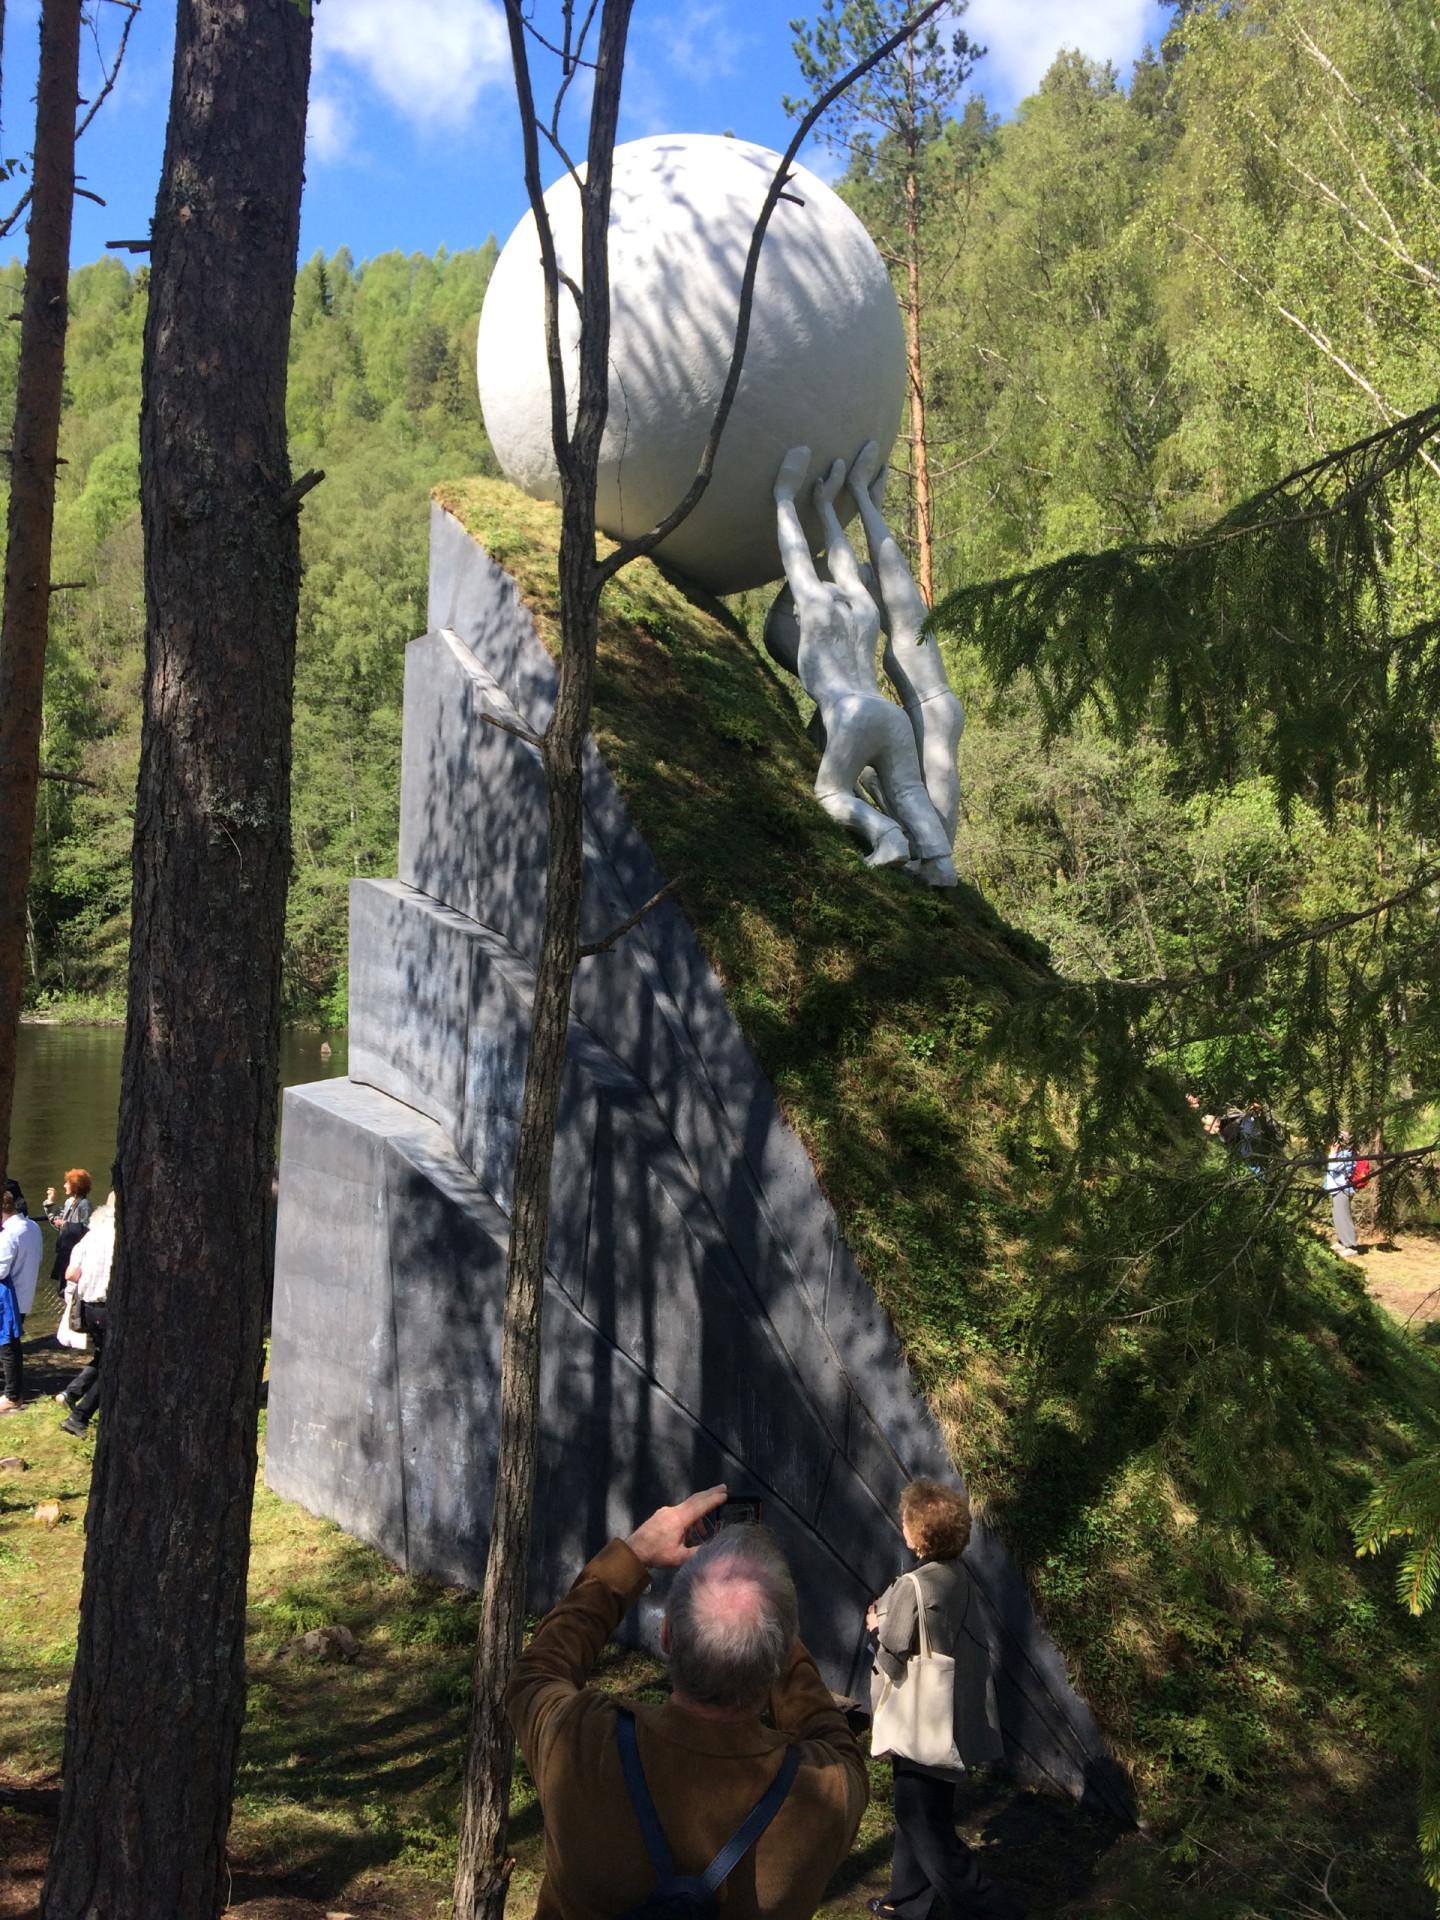 Илья и Эмилия Кабаковы, «The Ball» («Шар»), парк Кистефос, Норвегия